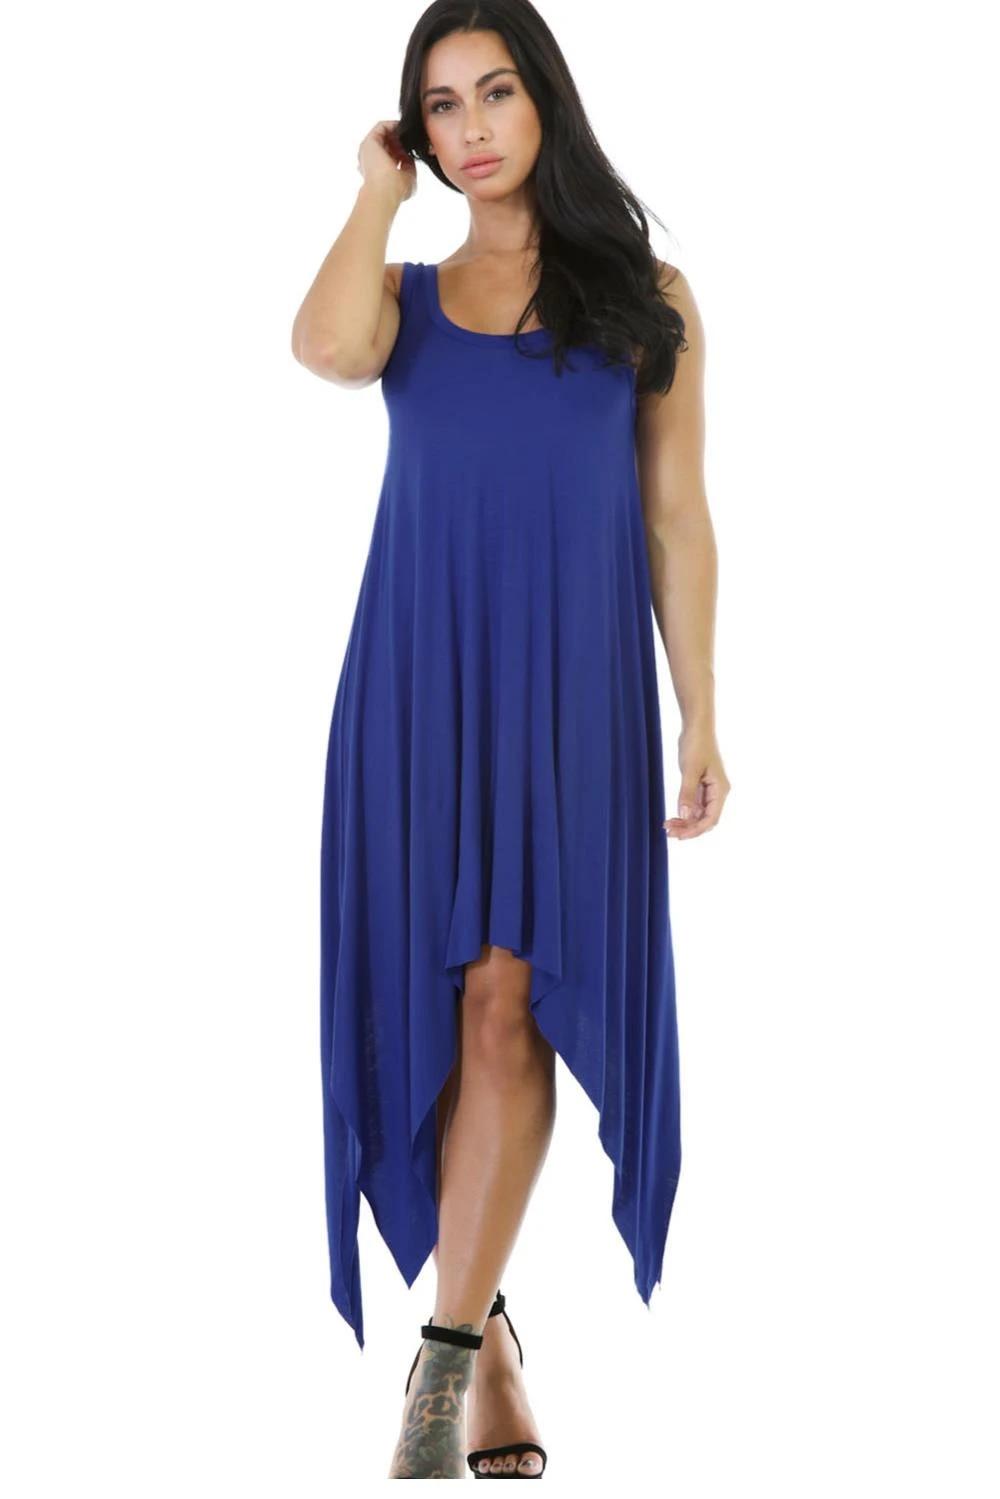 plus size wemen dress robe offer natural hollow out regular